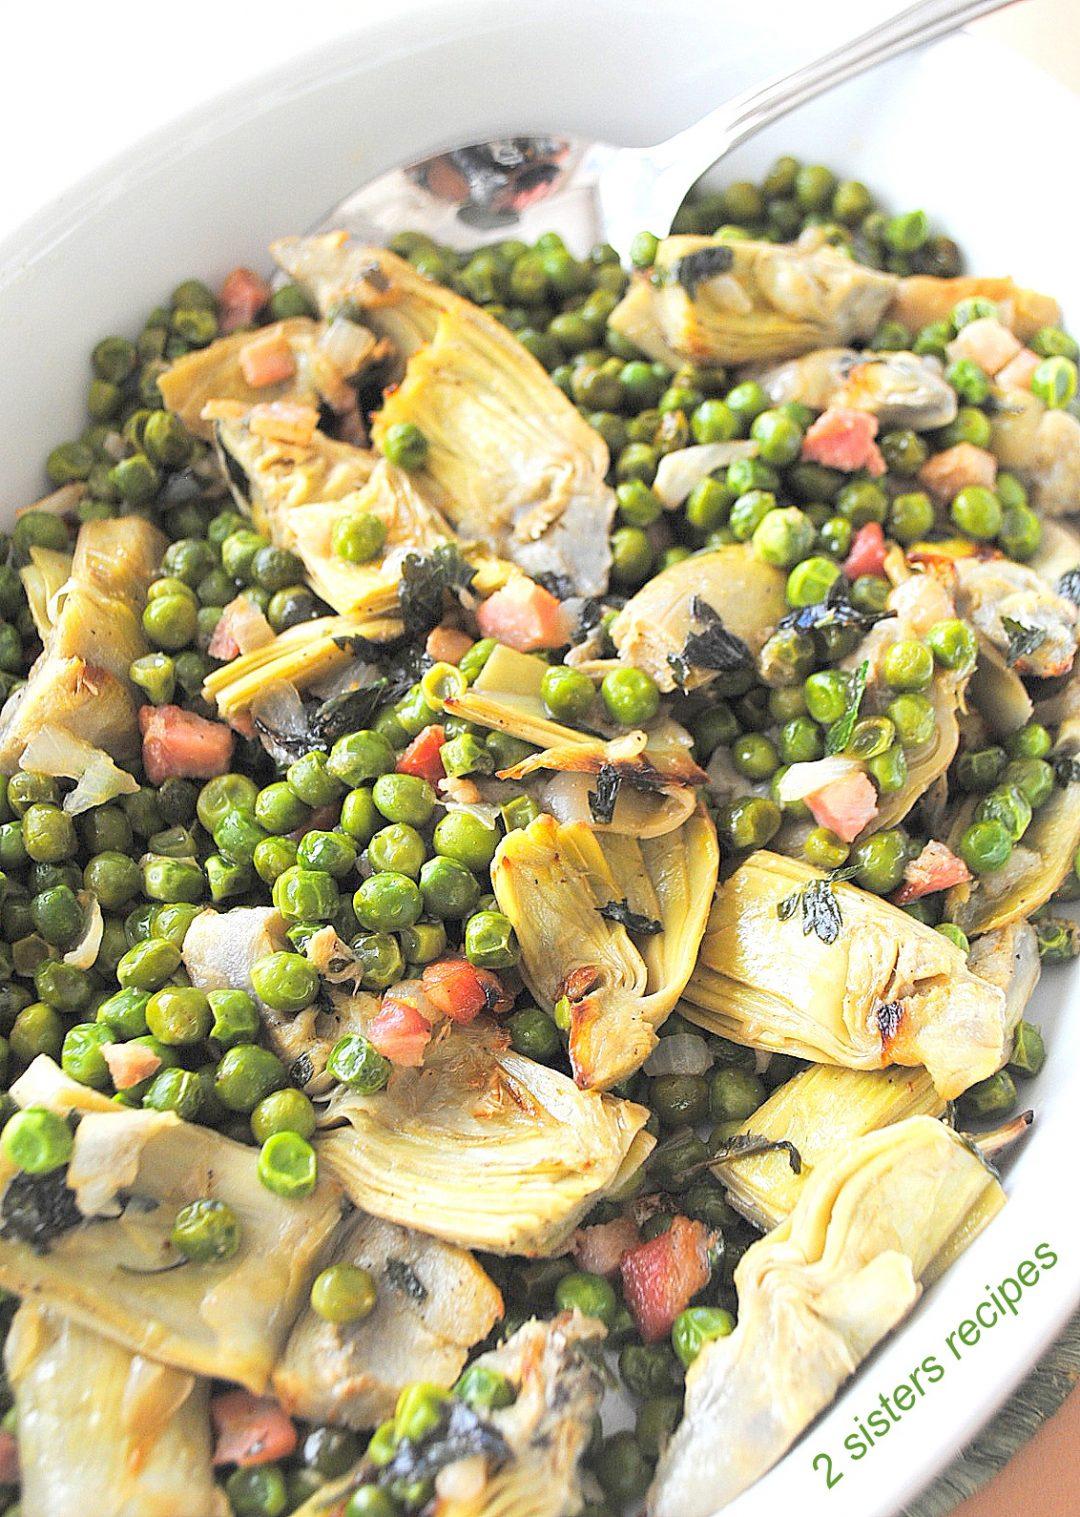 Baked Peas and Artichoke Hearts by 2sistersrecipes.com